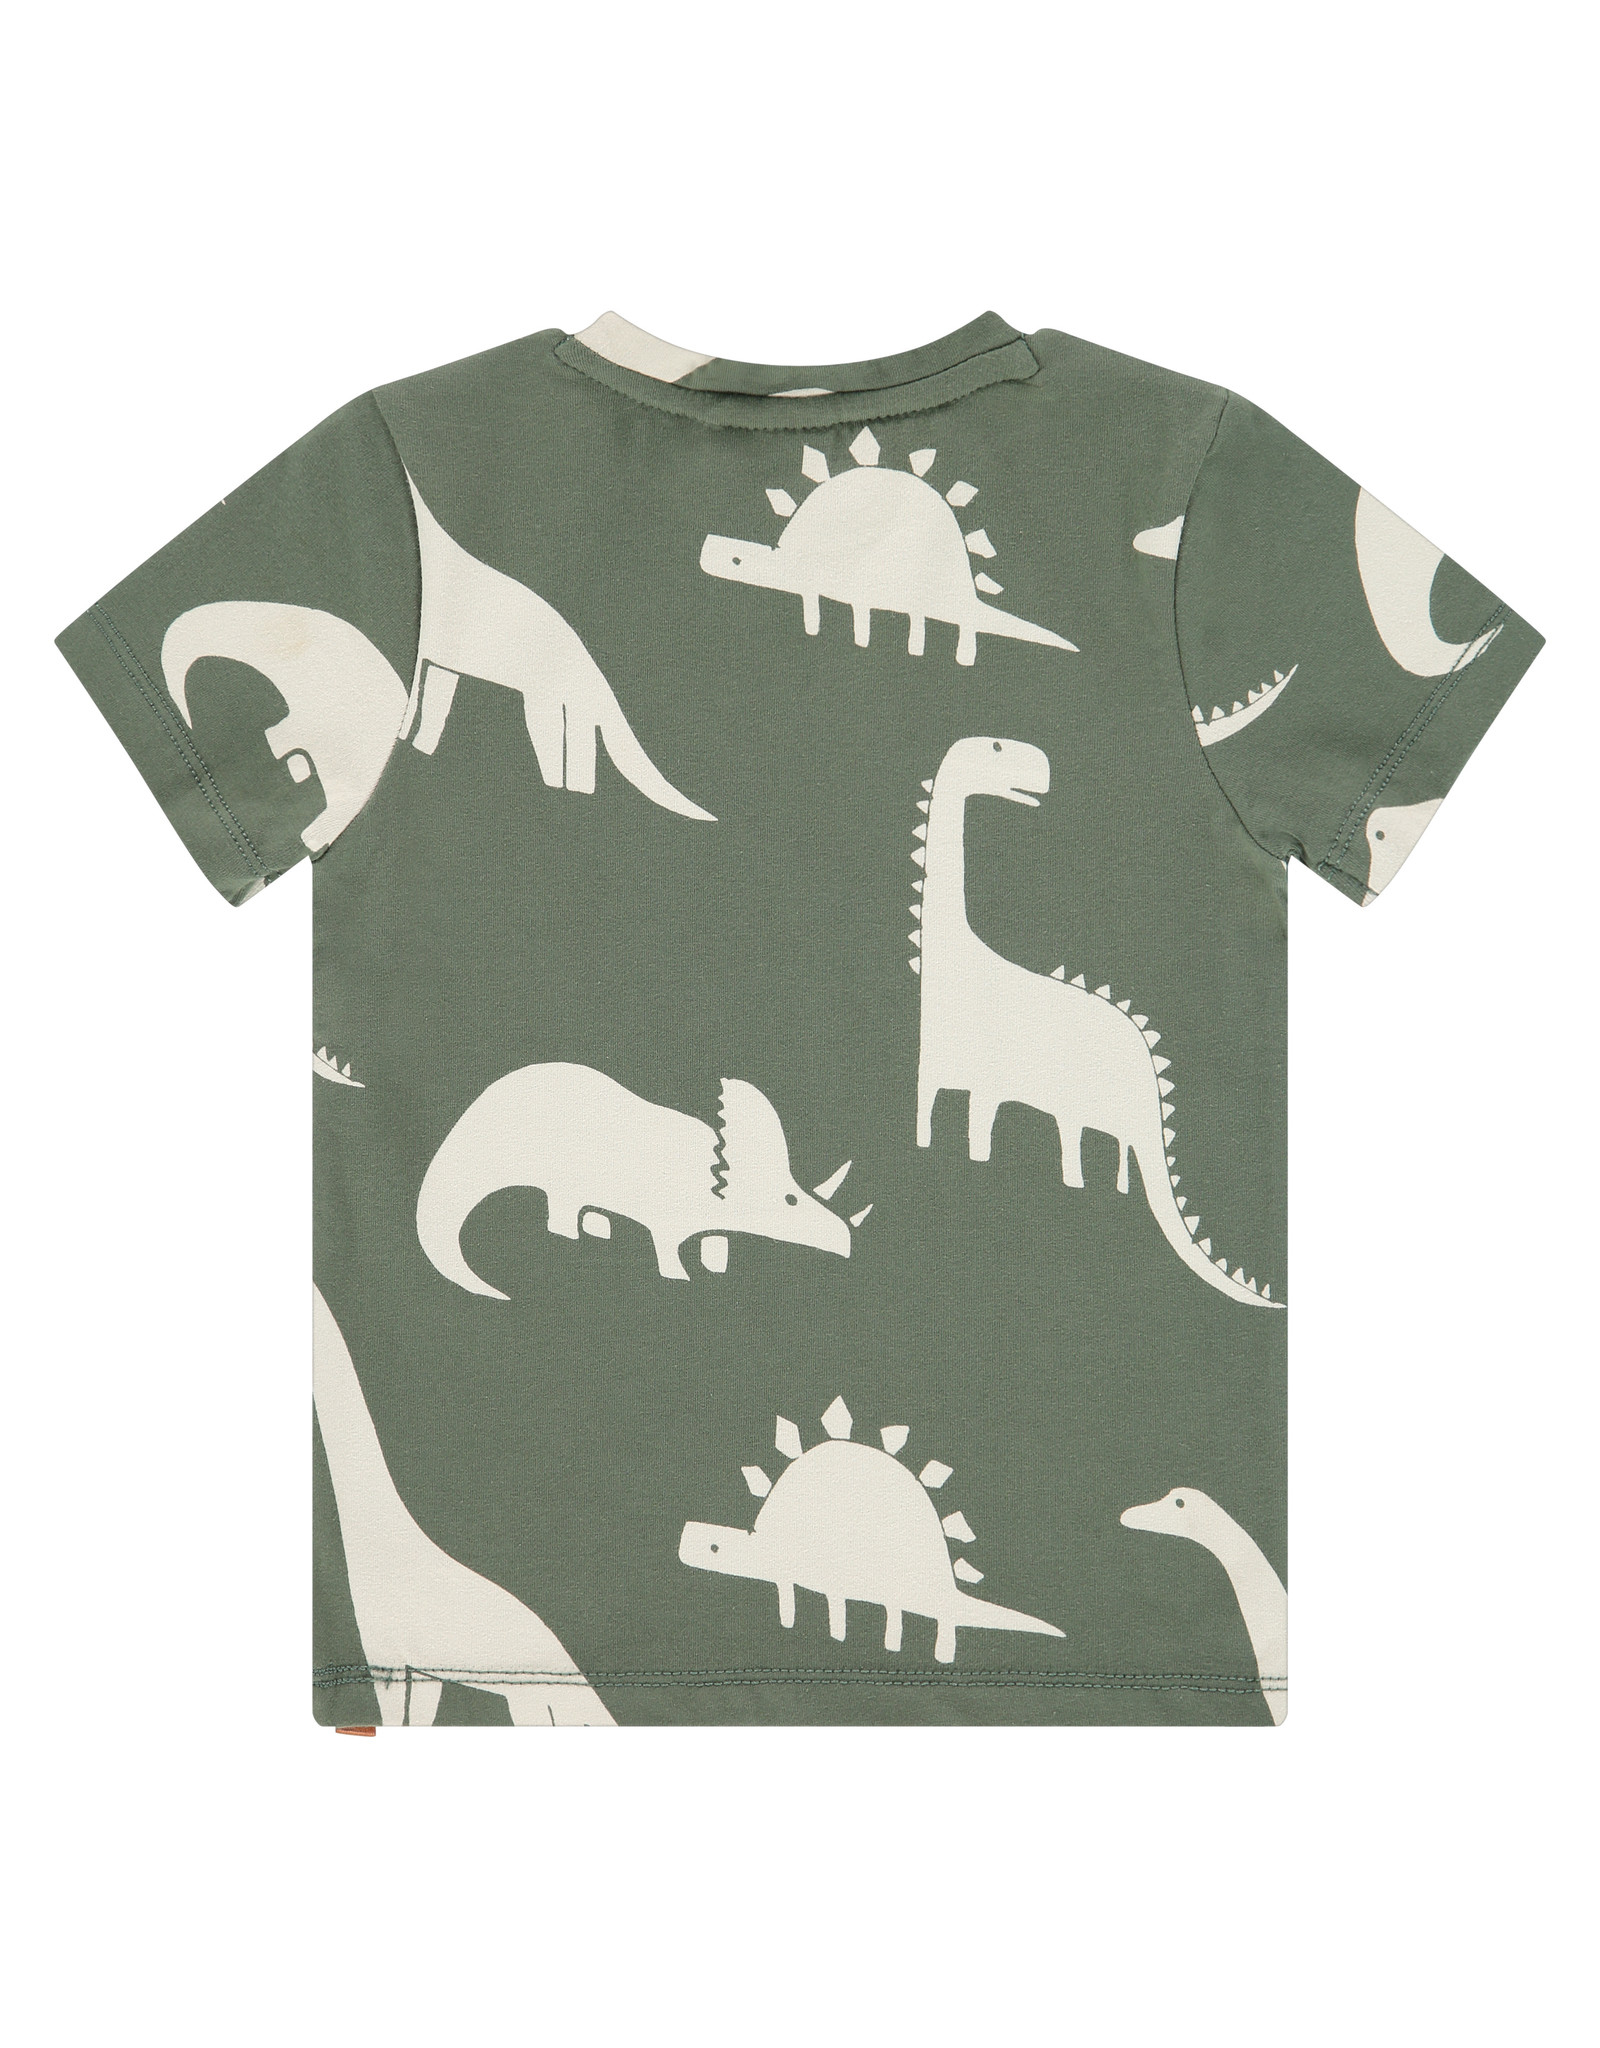 Babyface boys t-shirt short sleeve, army, BBE21107614